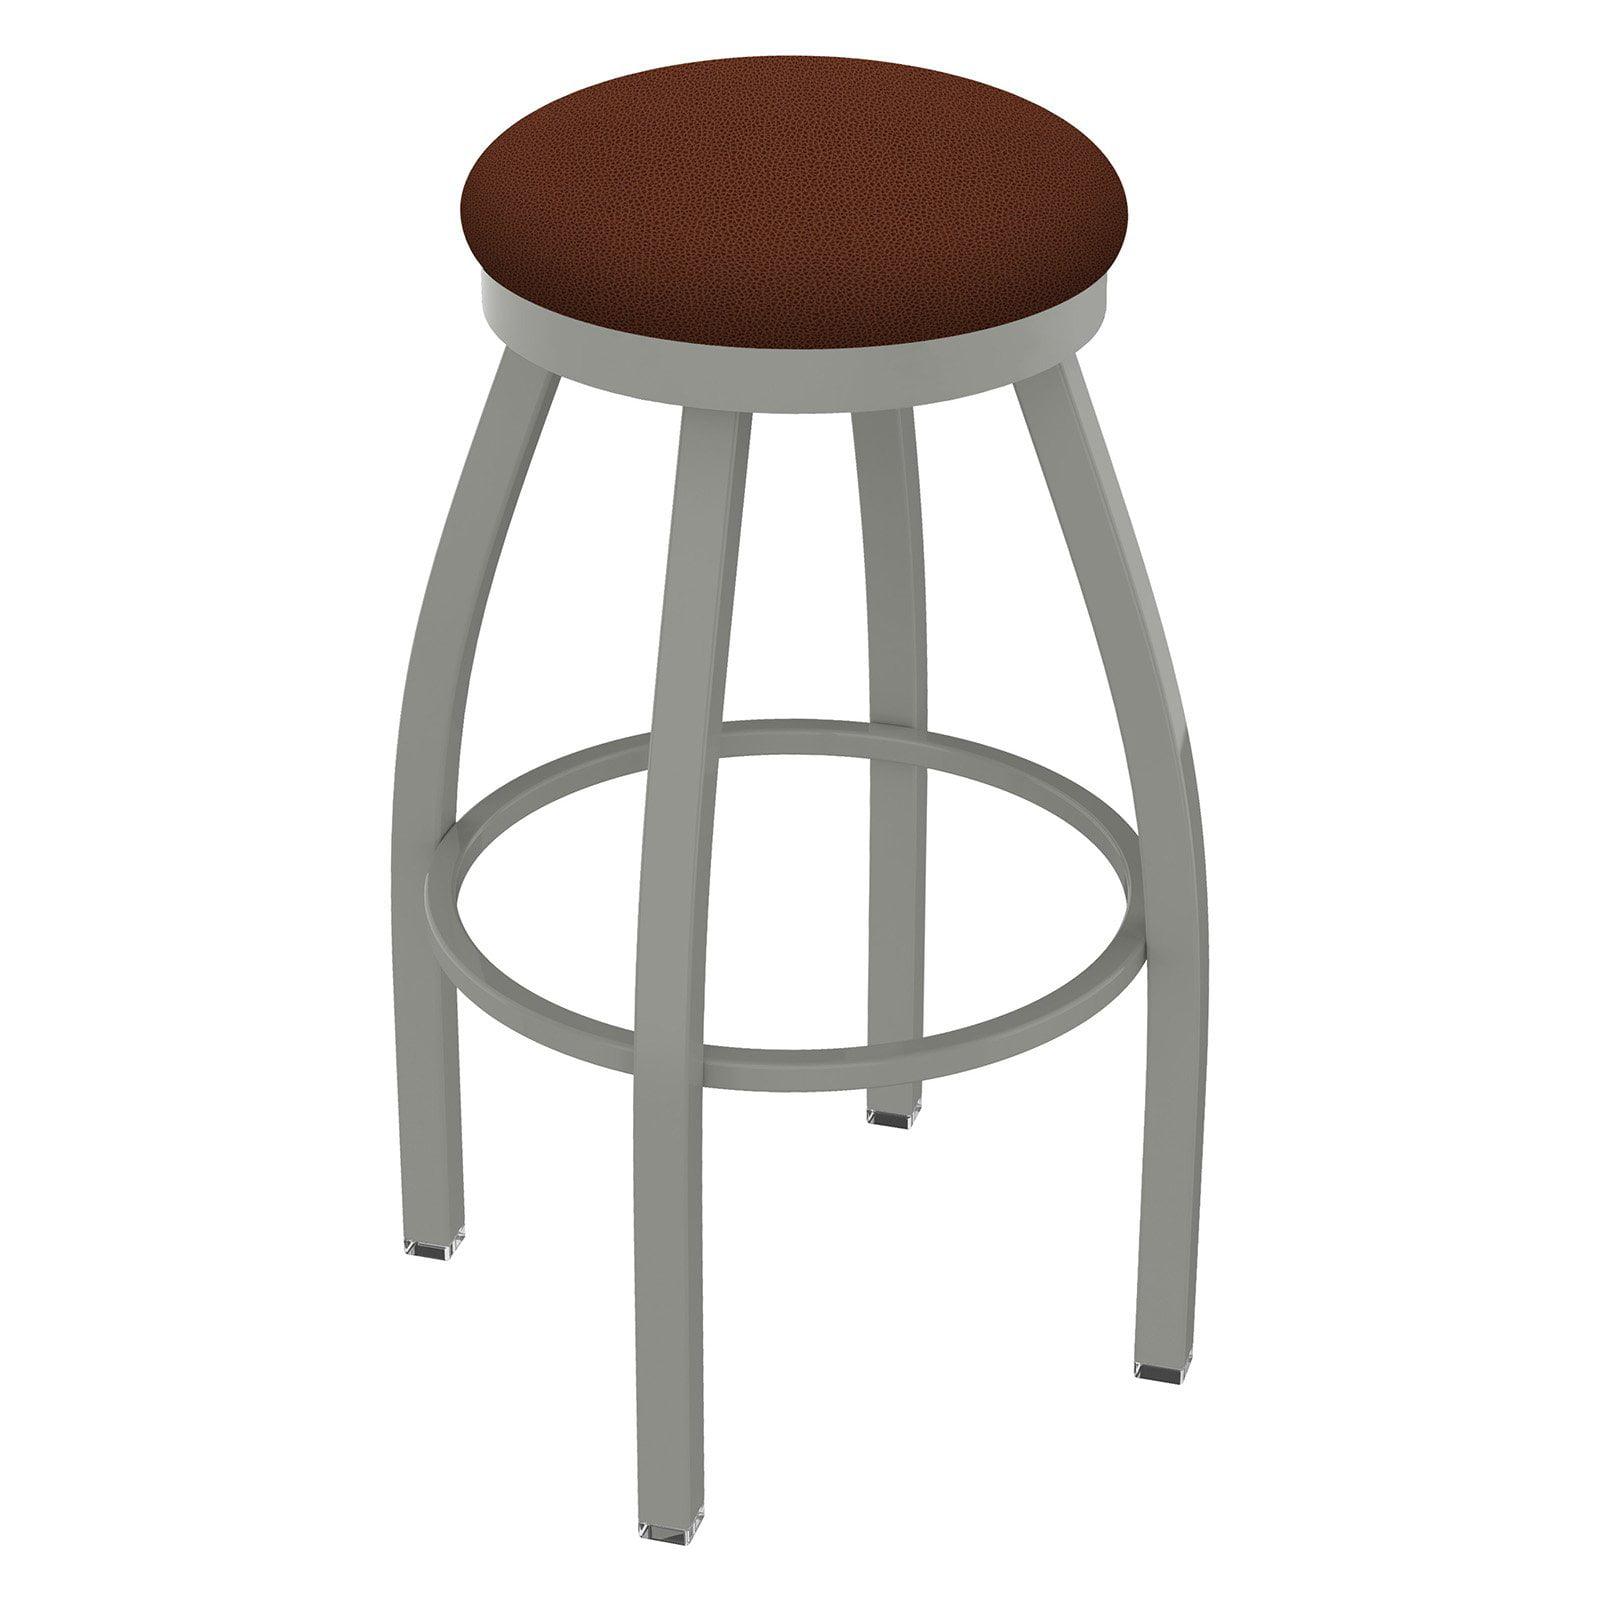 Peachy Holland Bar Stool Co Misha Metal 36 In Extra Tall Swivel Bar Stool With Faux Leather Seat Walmart Com Machost Co Dining Chair Design Ideas Machostcouk